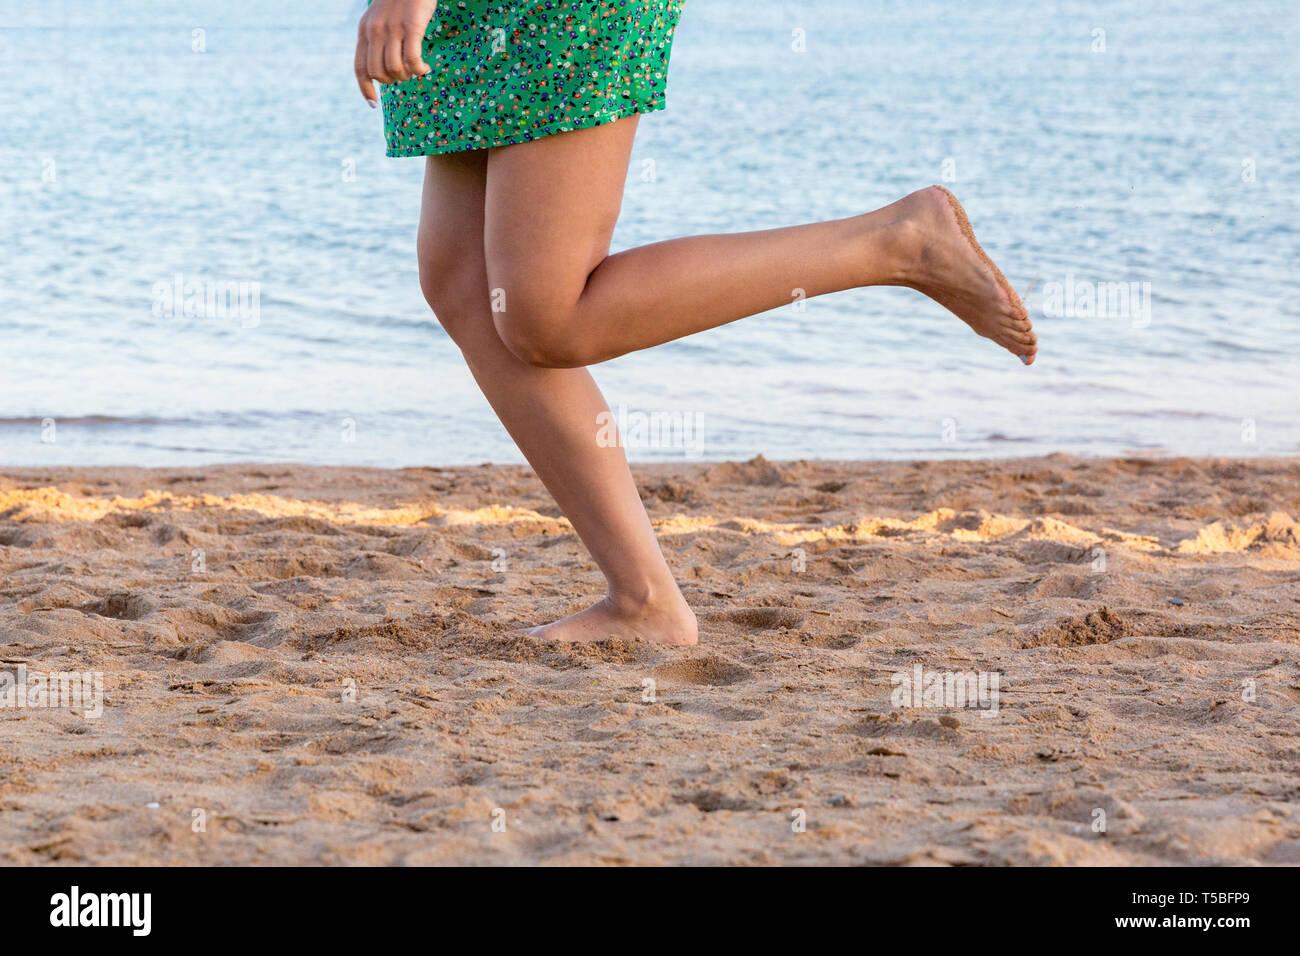 Woman Profile Legs Running Stock Photos & Woman Profile Legs Running